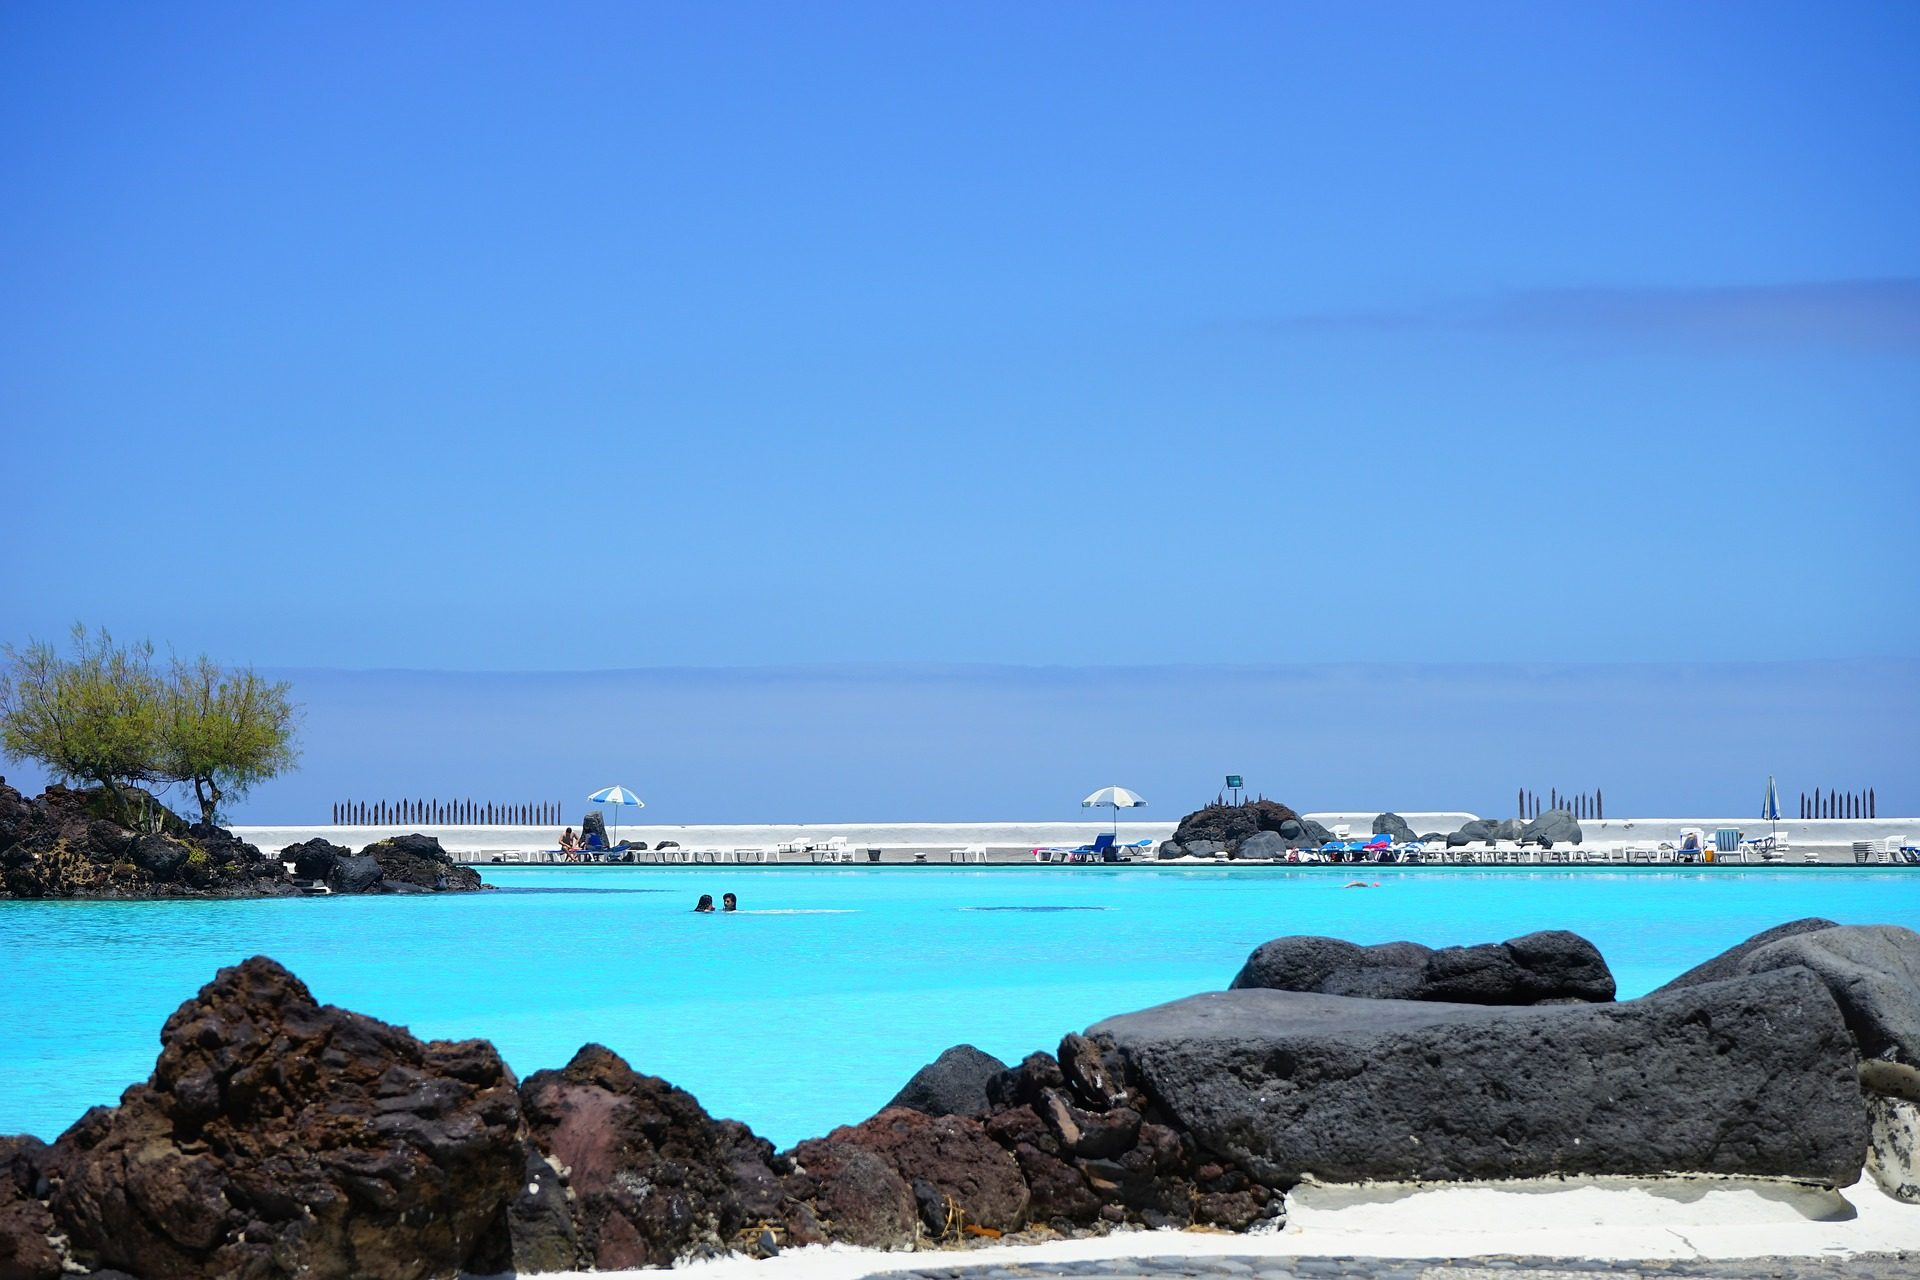 Kurzurlaub auf Teneriffa 3 Nächte günstig ab 43,00€ Flug + Hotel